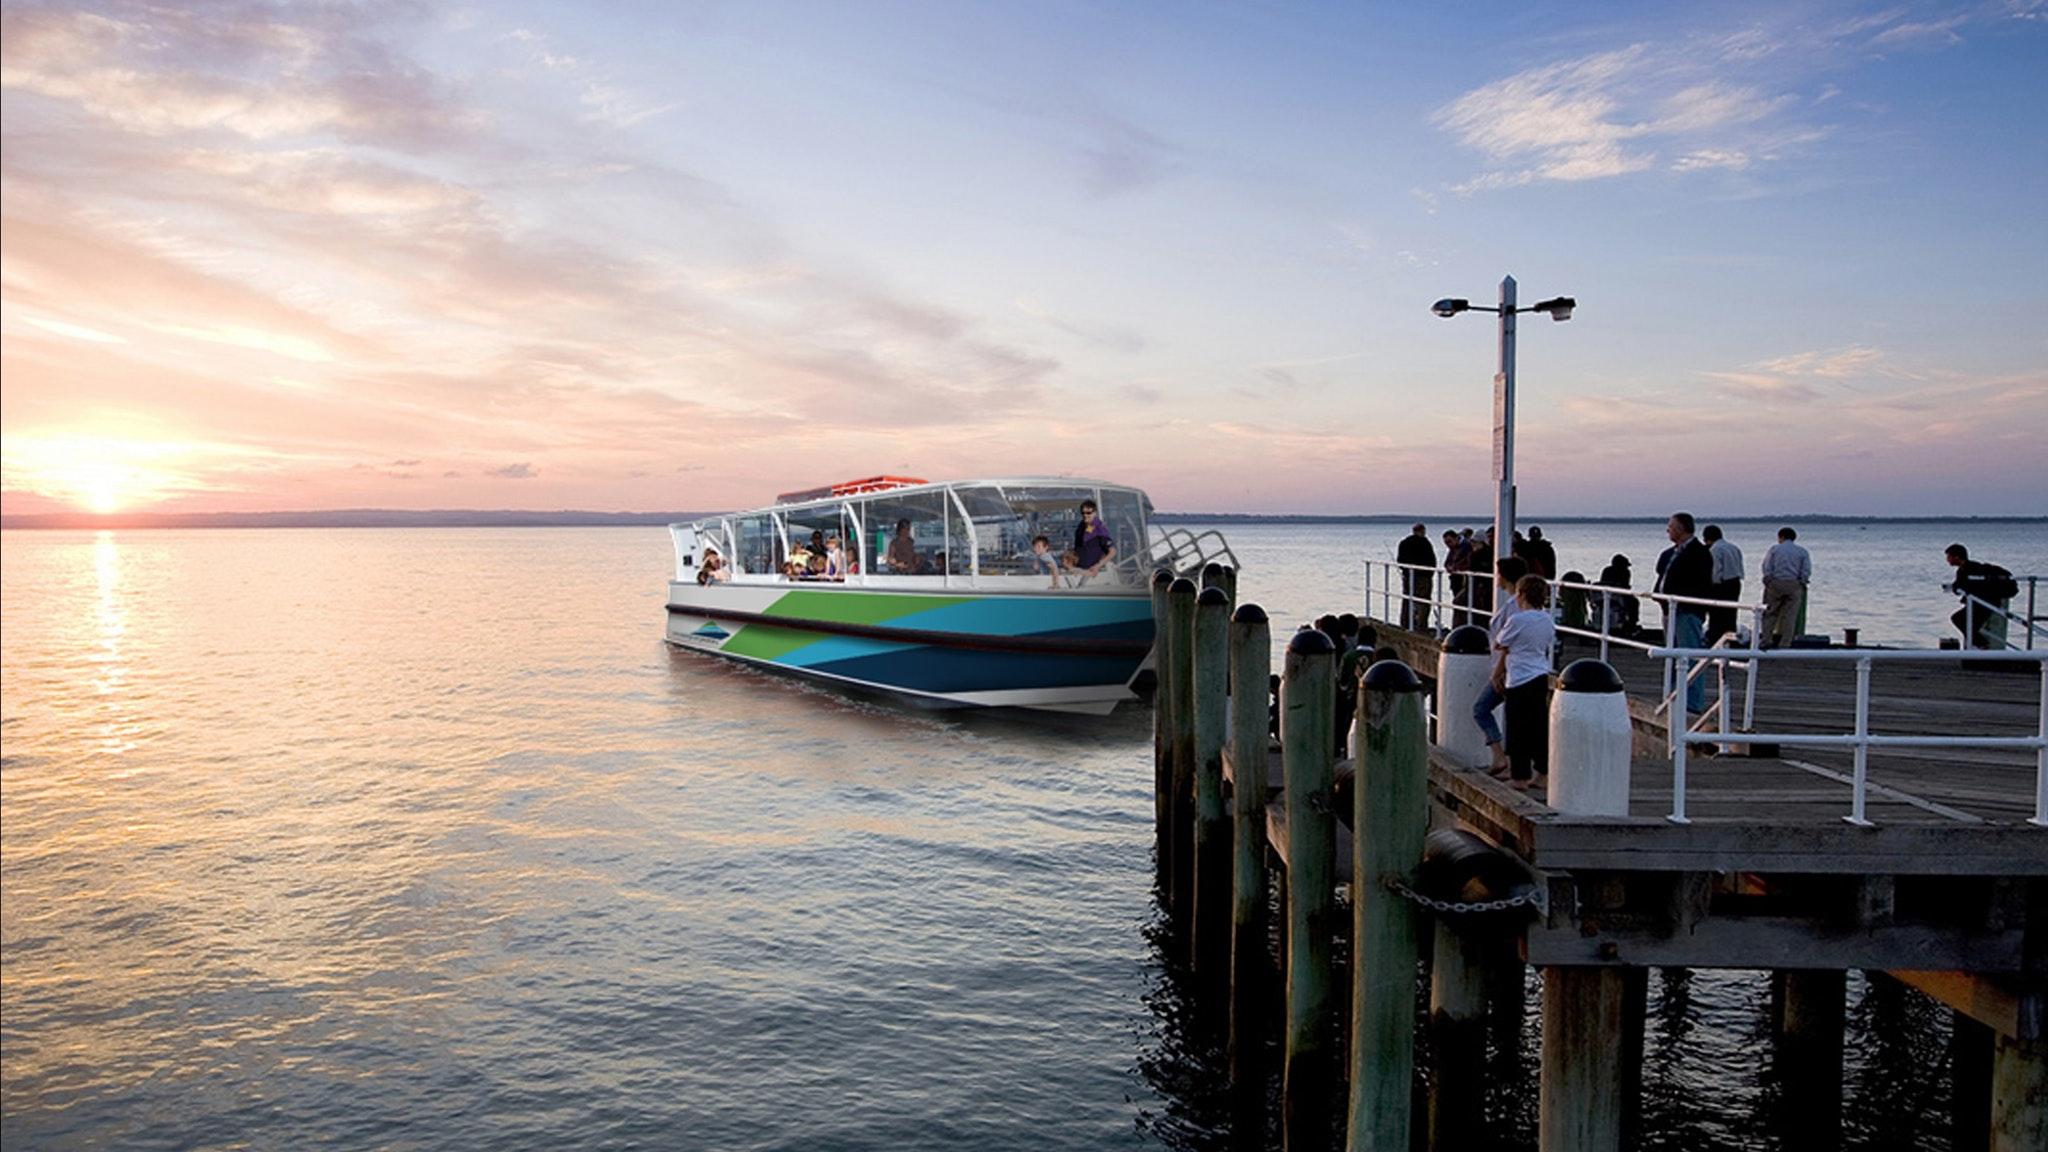 Western Port Ferries arriving at Phillip Island